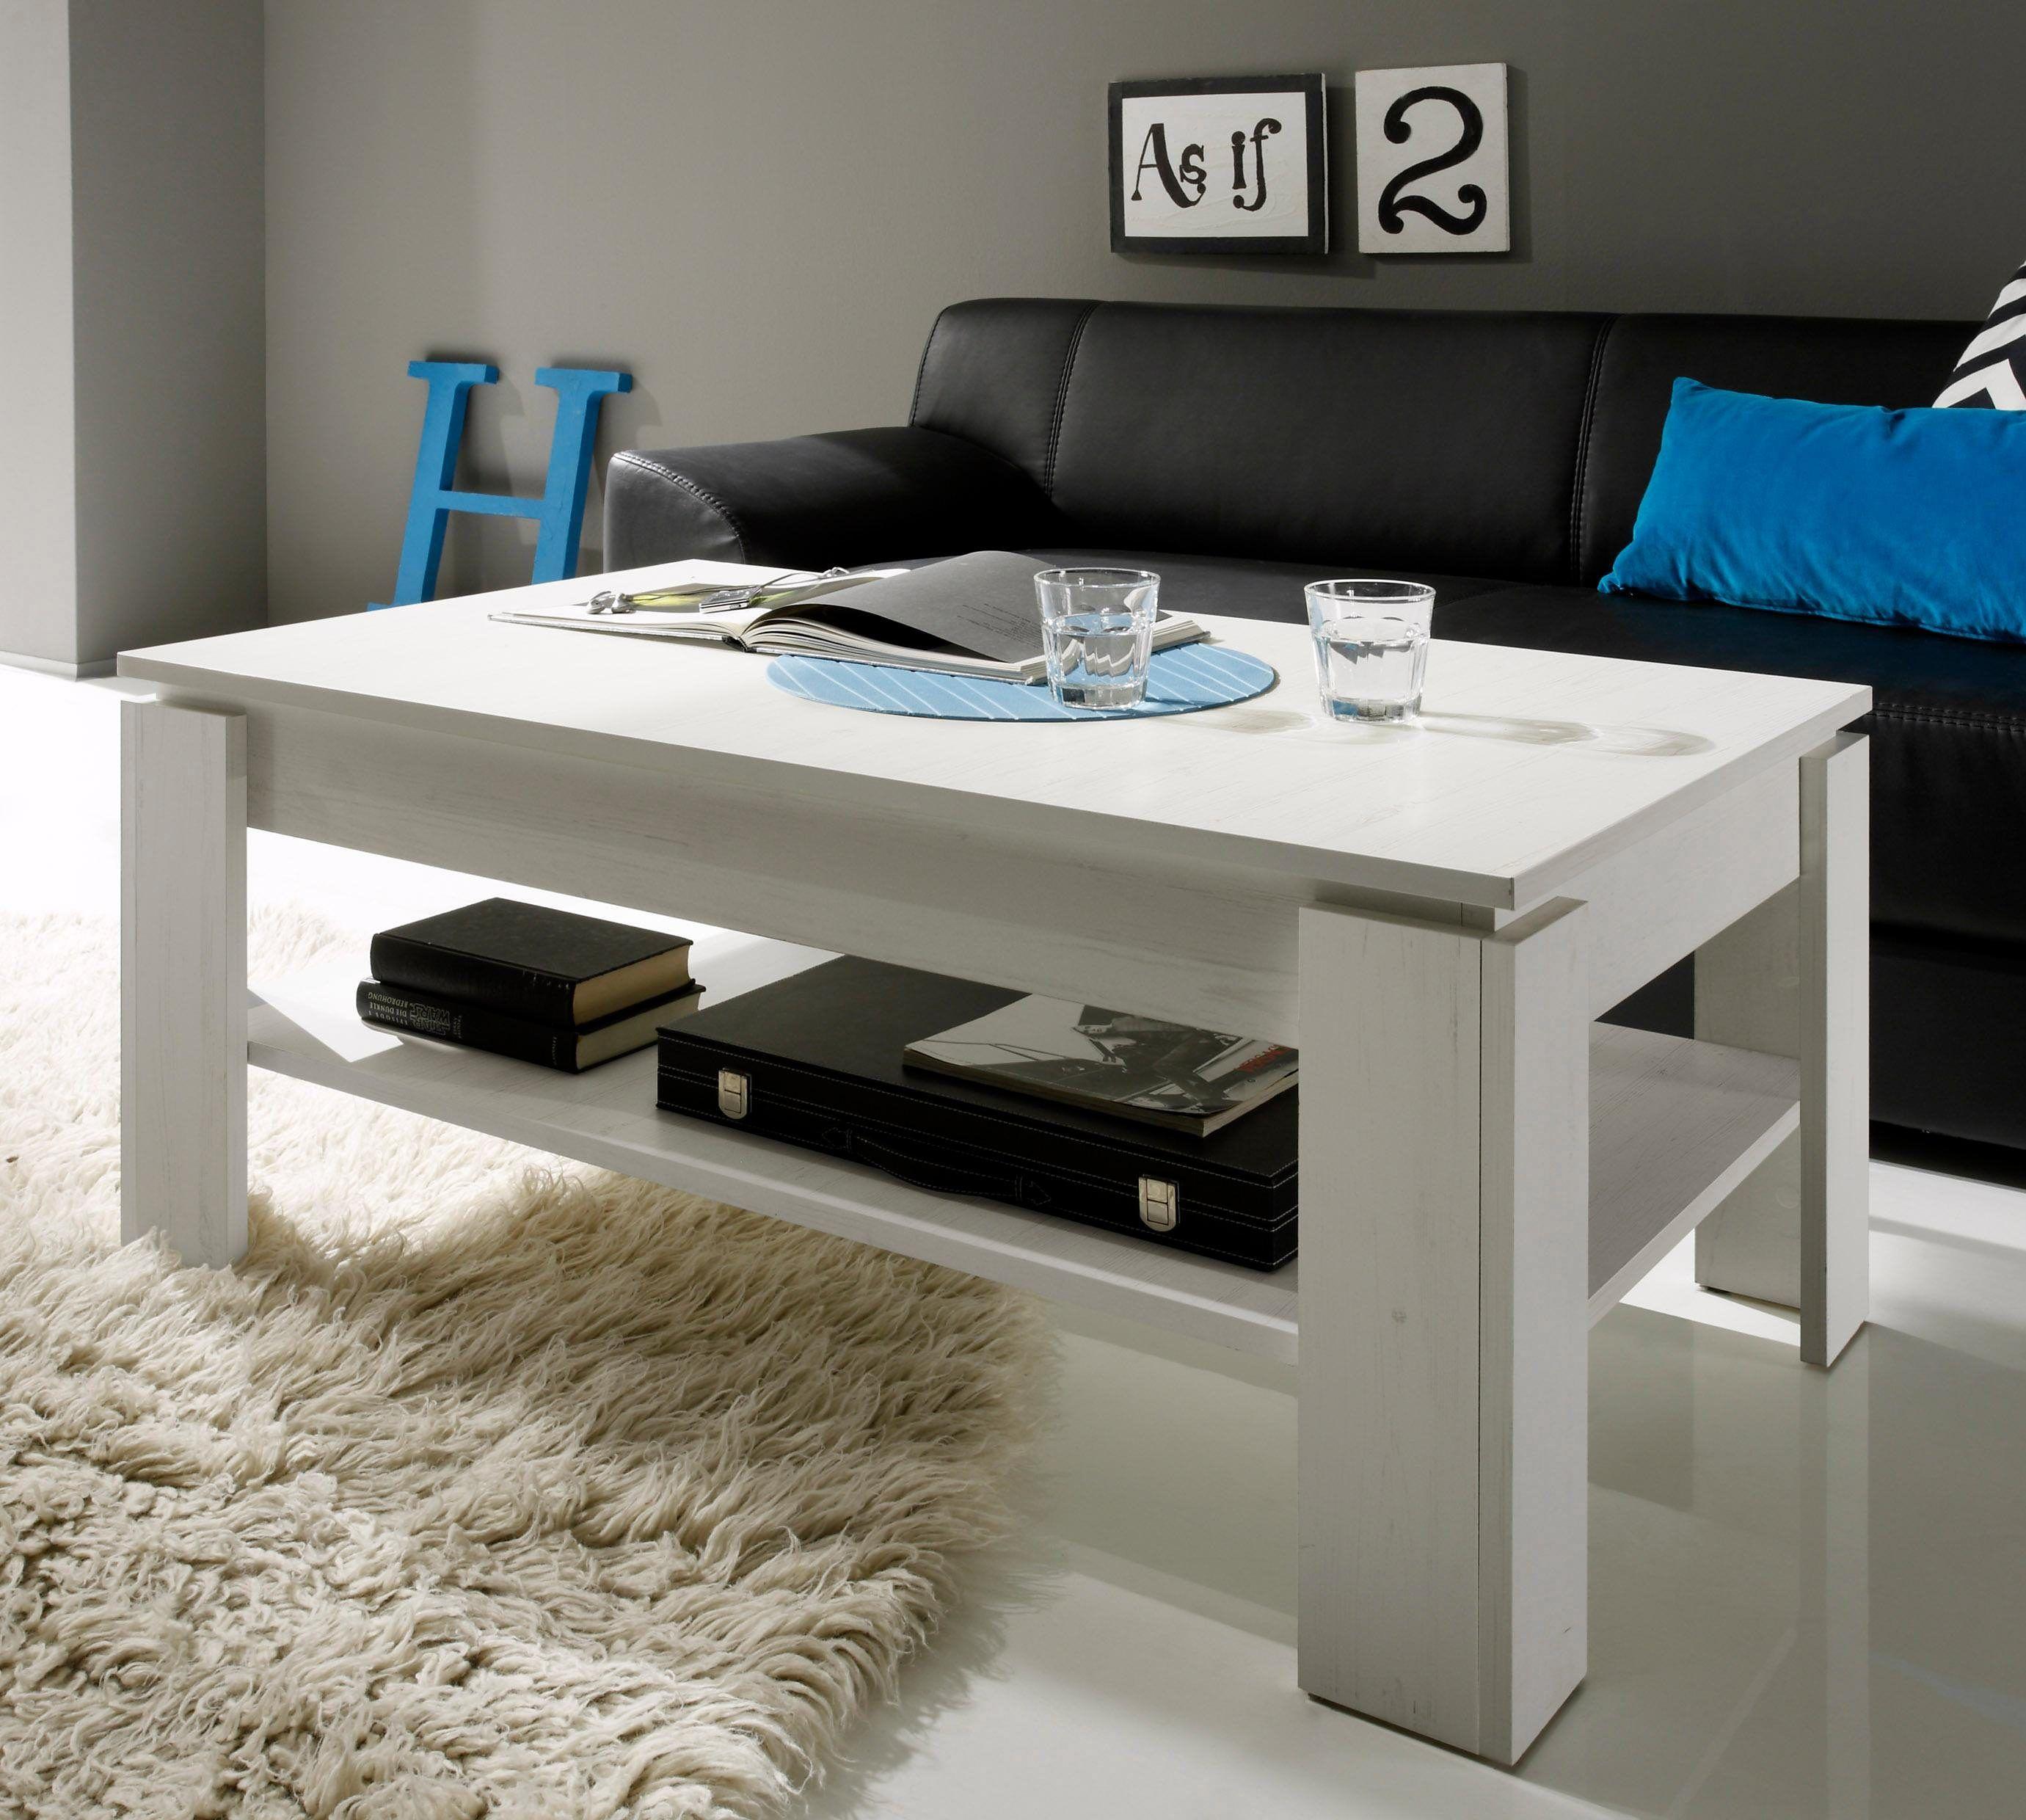 71dec832a56cee5292430ef26a69f98b Luxe De Table Basse Laque Blanc Brillant Schème